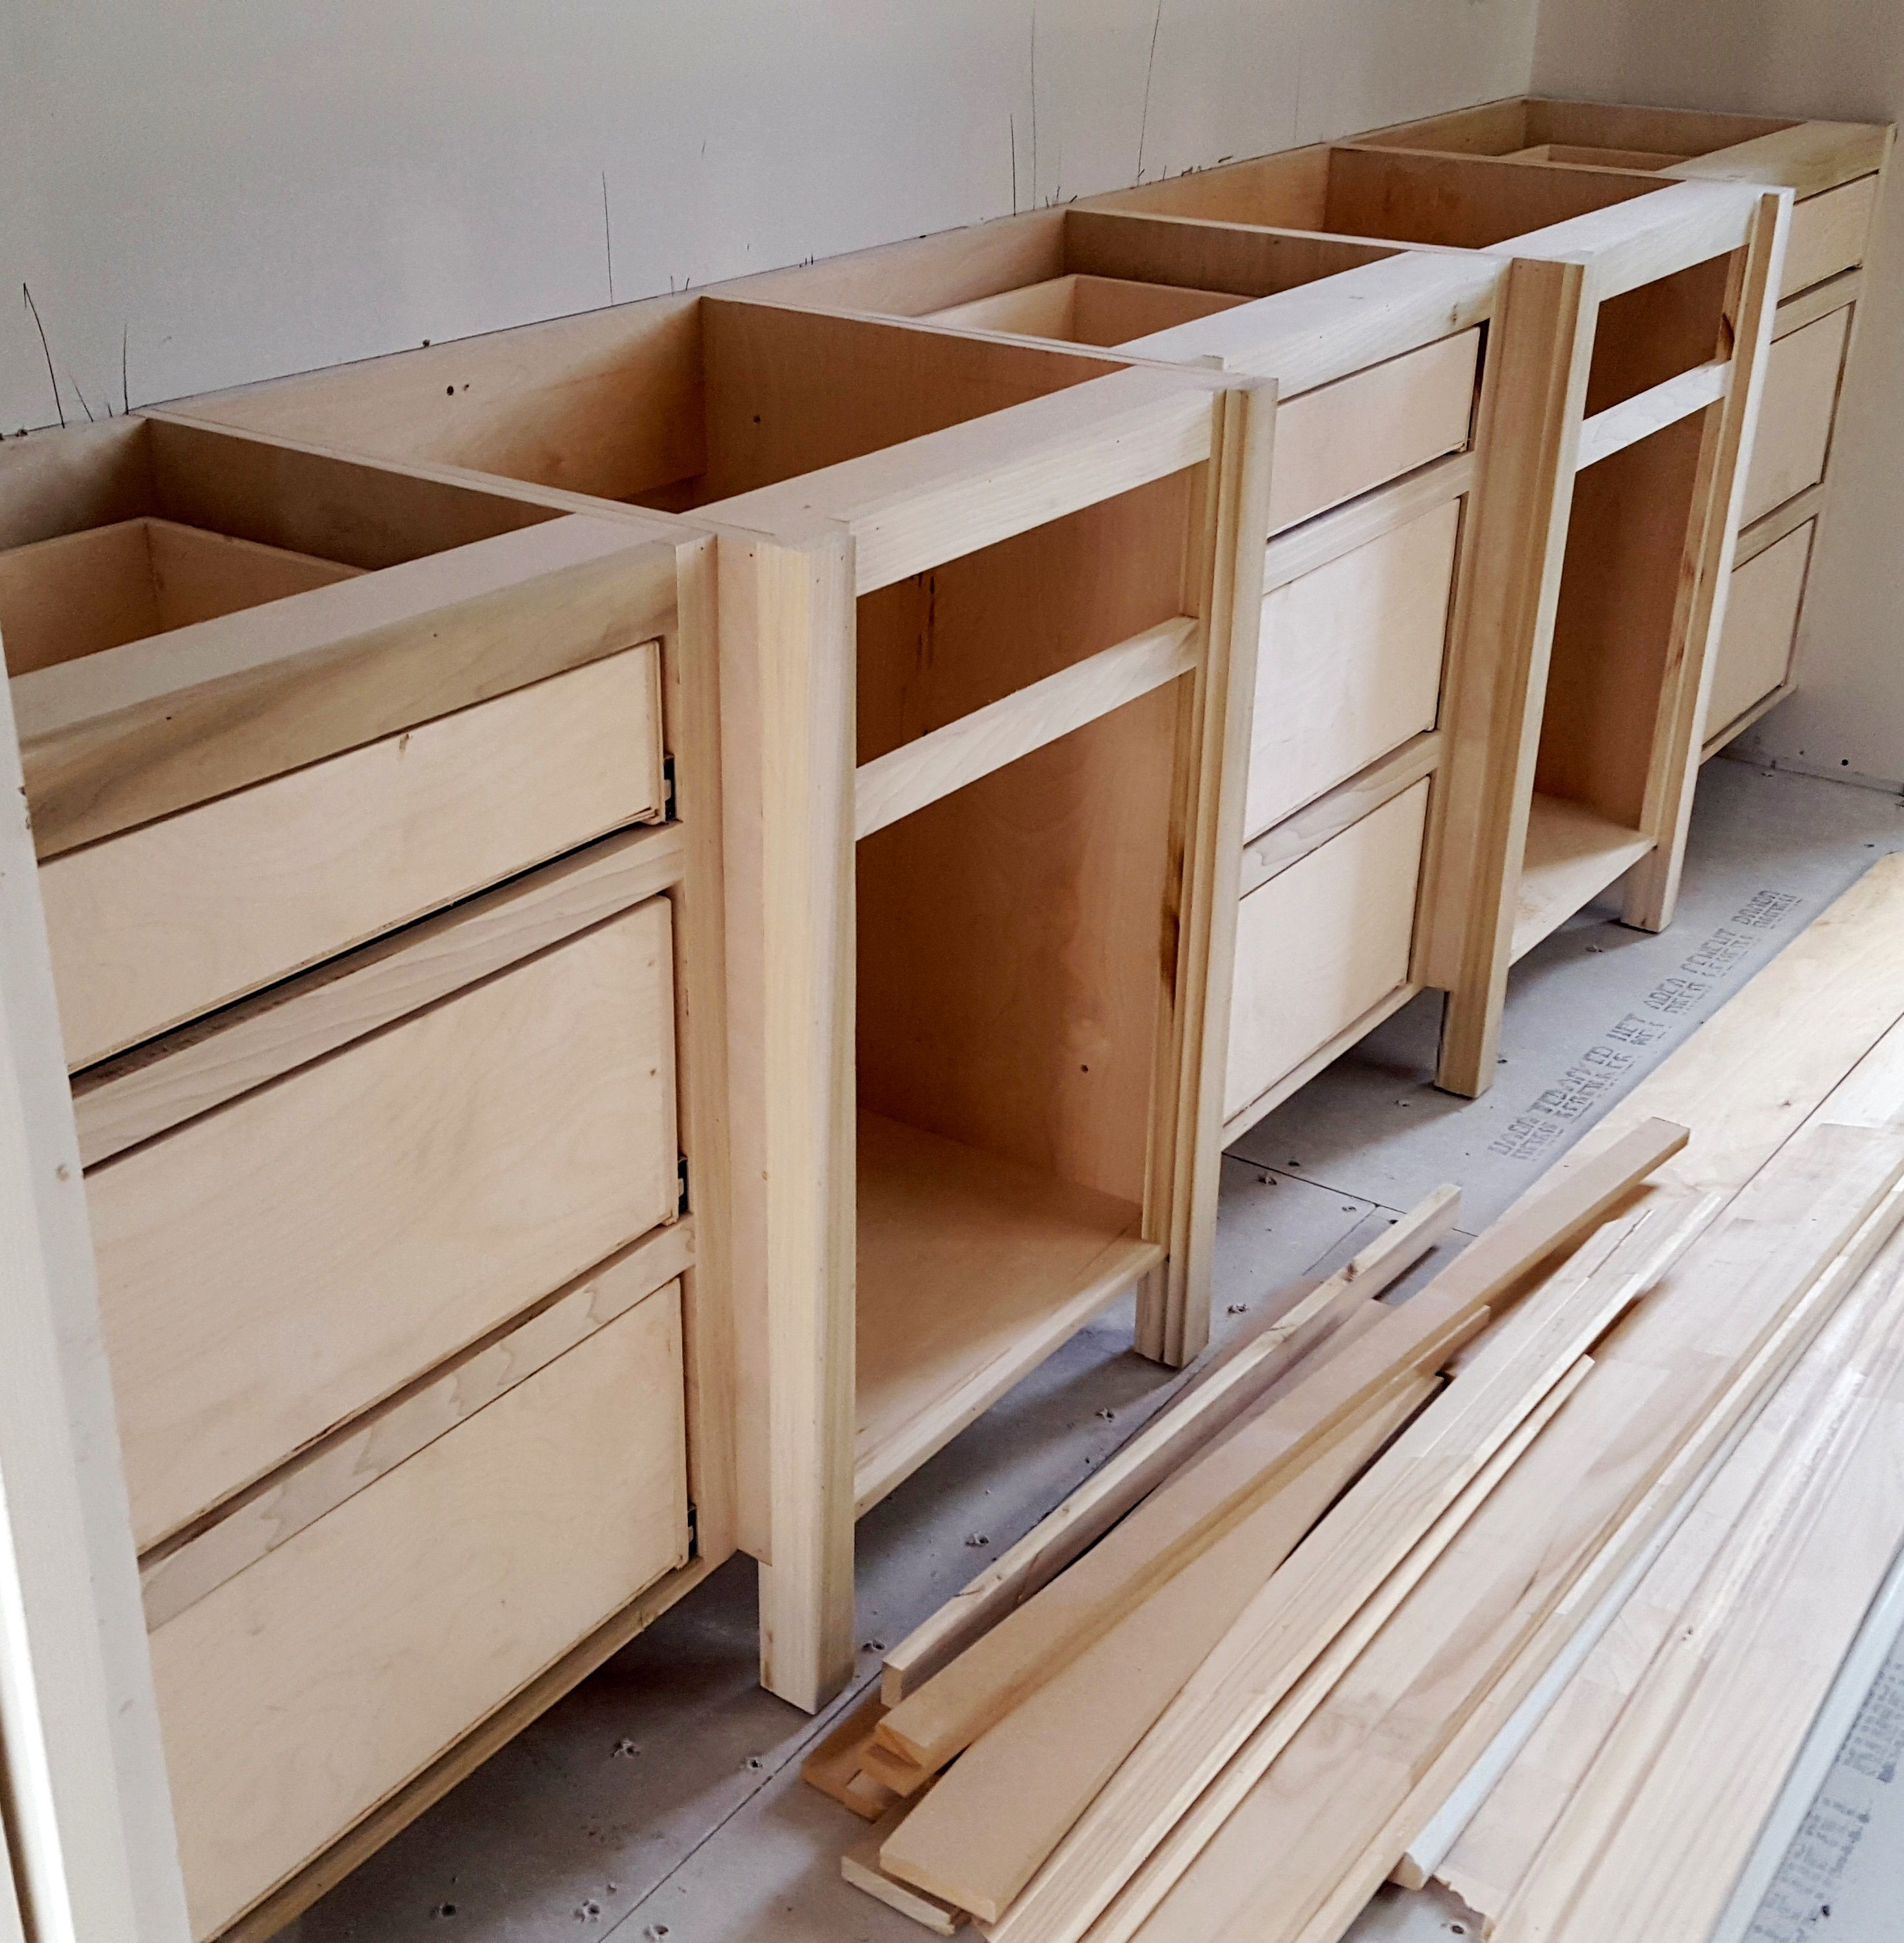 Typical job built bathroom vanity cabinets in progress In this